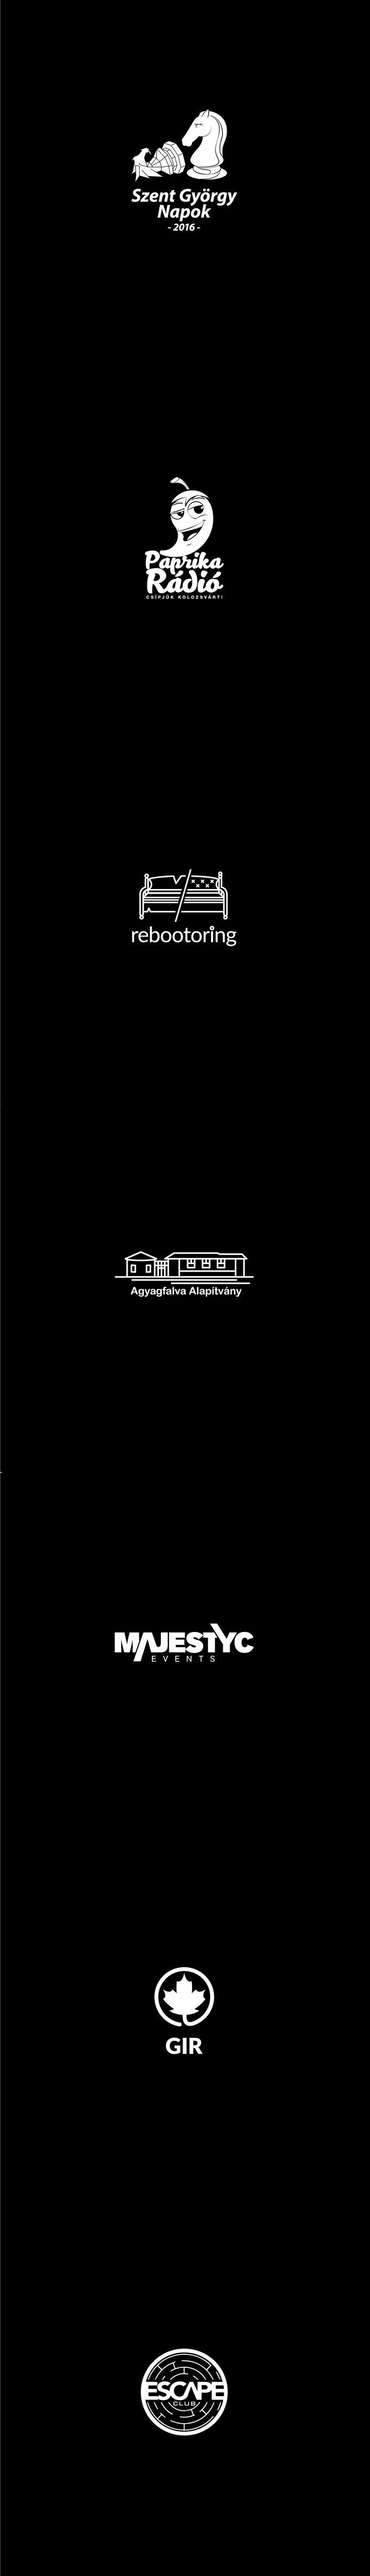 2016 logo showreel #logo #design #showreel #2016 #blackandwhite #black #white